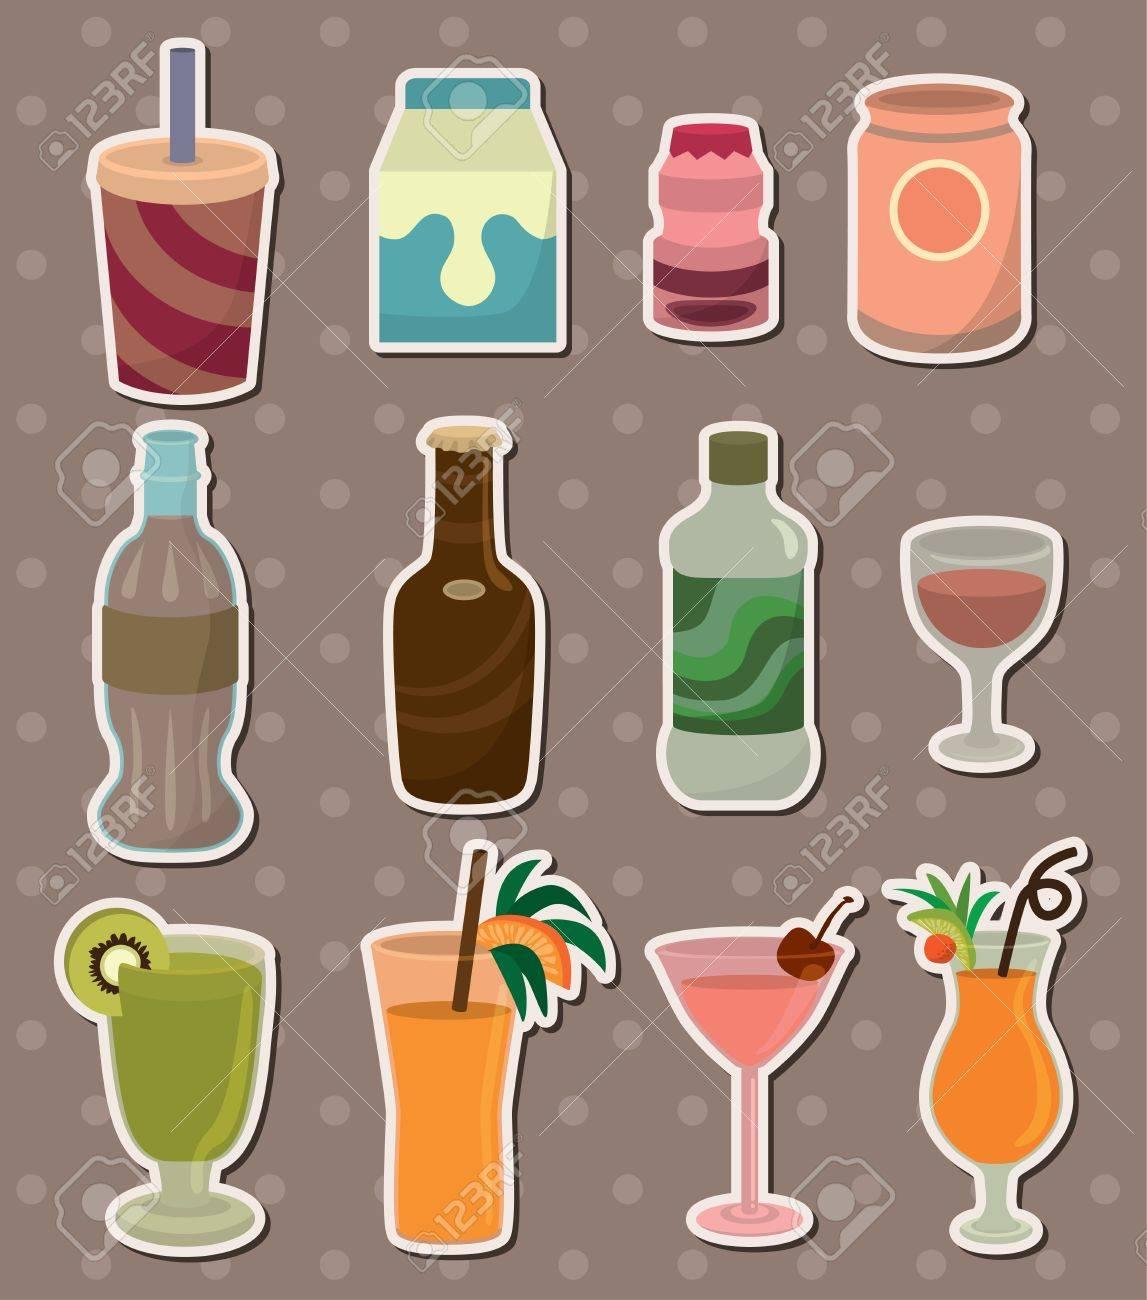 drink stickers - 13586774